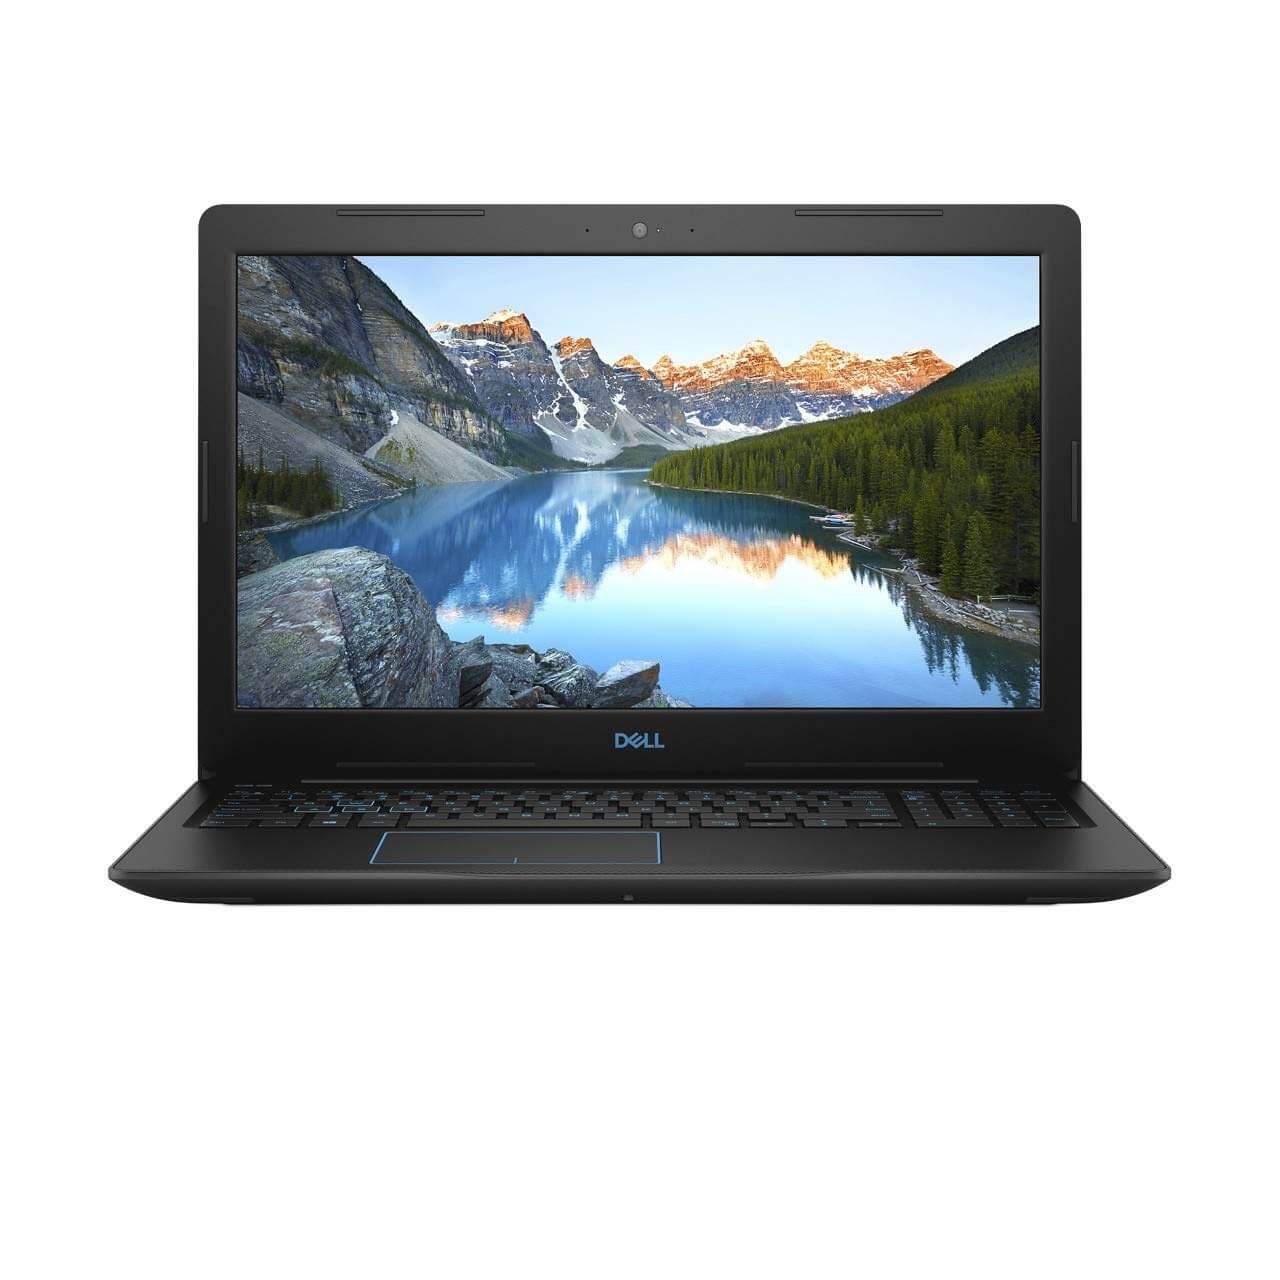 Dell G3 3579 laptop